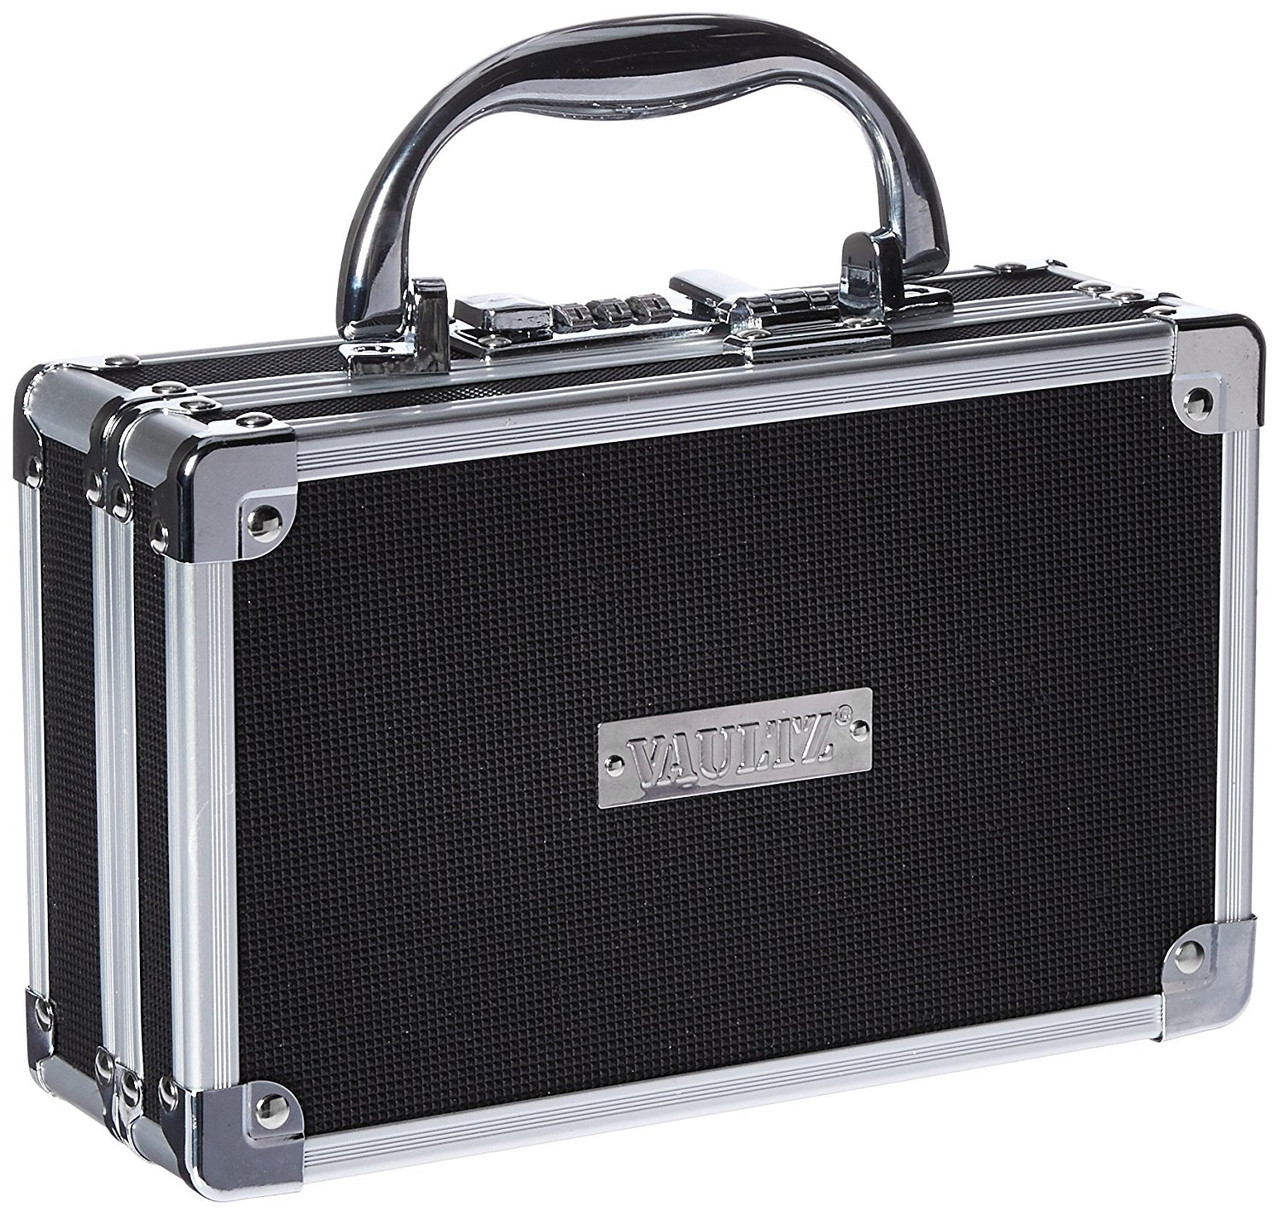 Vaultz Security Box Black